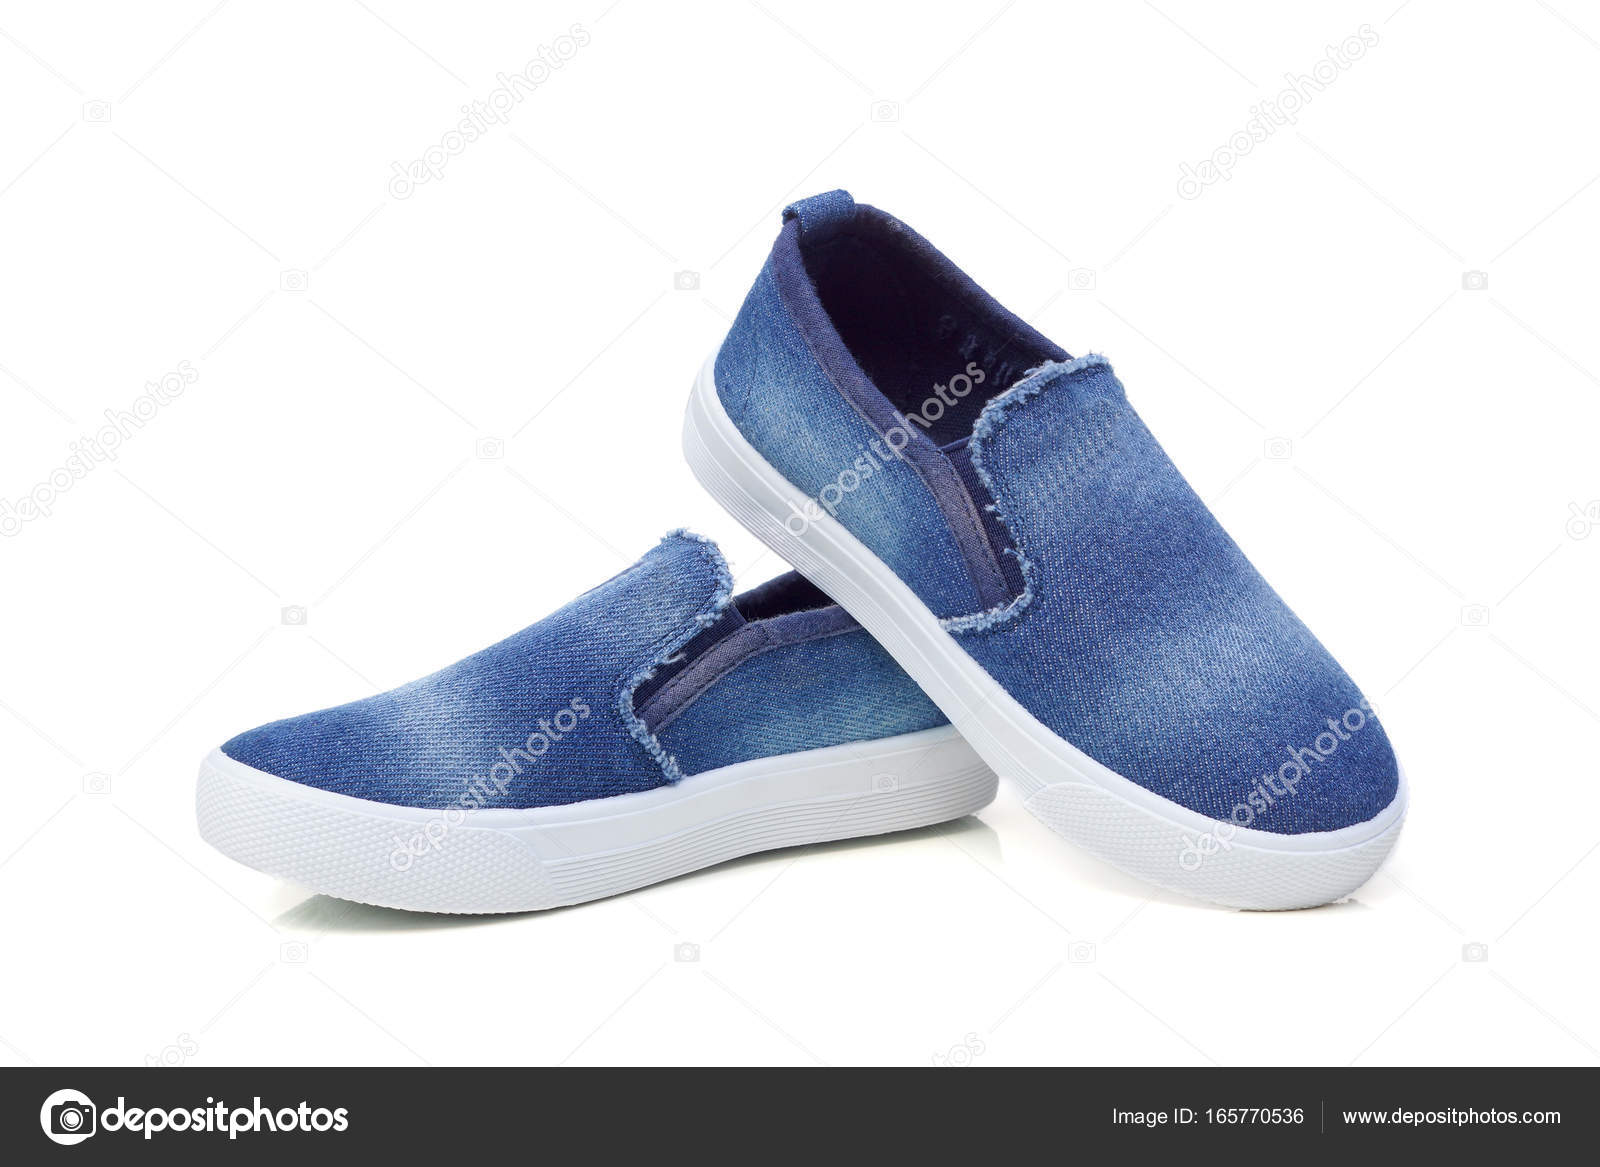 eda048bf6d8 Ζαν τζιν παντοφλέ παπούτσια — Φωτογραφία Αρχείου © weerapat #165770536